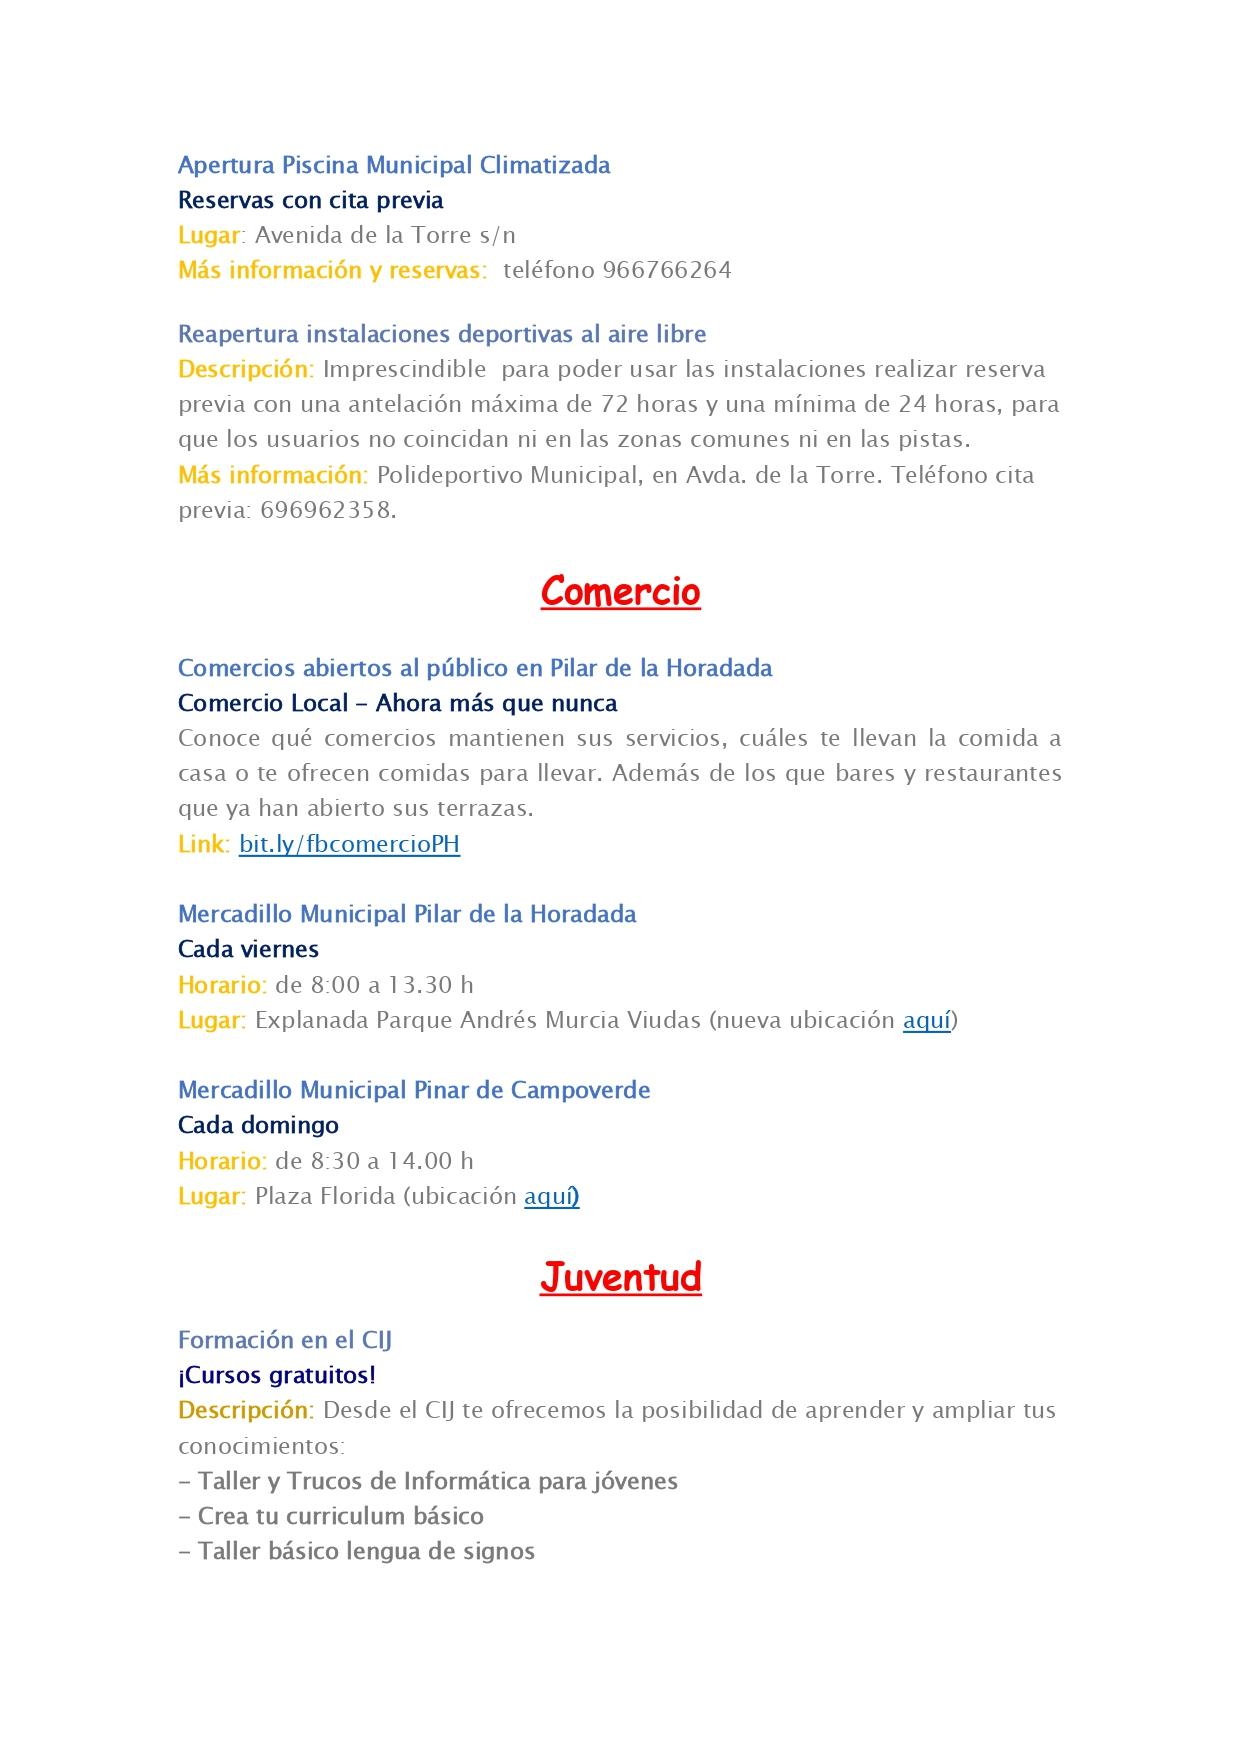 AGENDA_DE_EVENTOS_especial_PilardelaHoradadaTeEspera_25_junio_page-0002.jpg